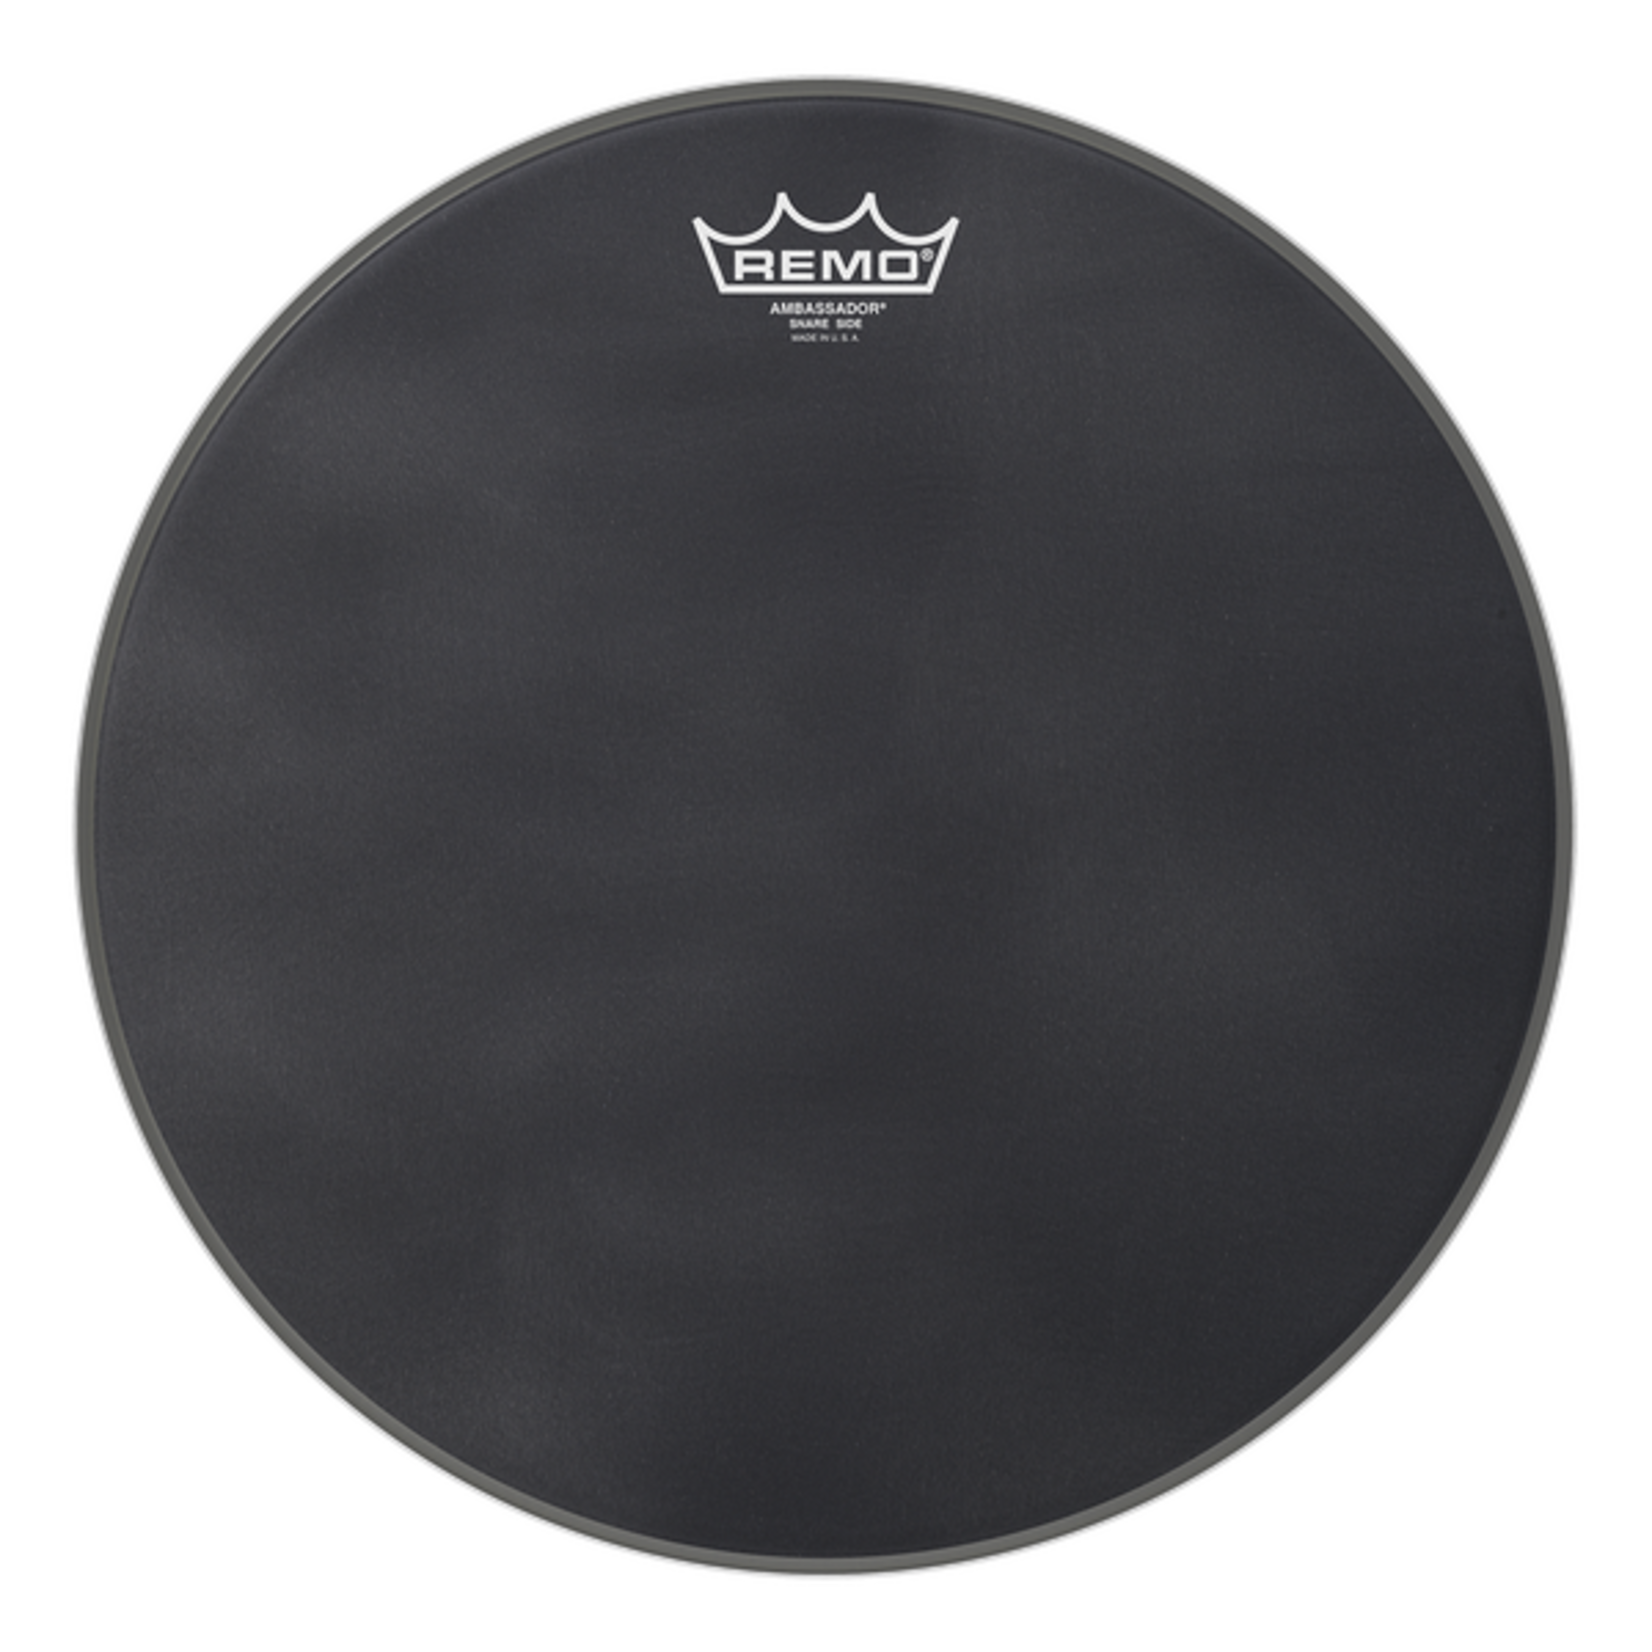 Remo Remo Black Suede Ambassador Snare Side